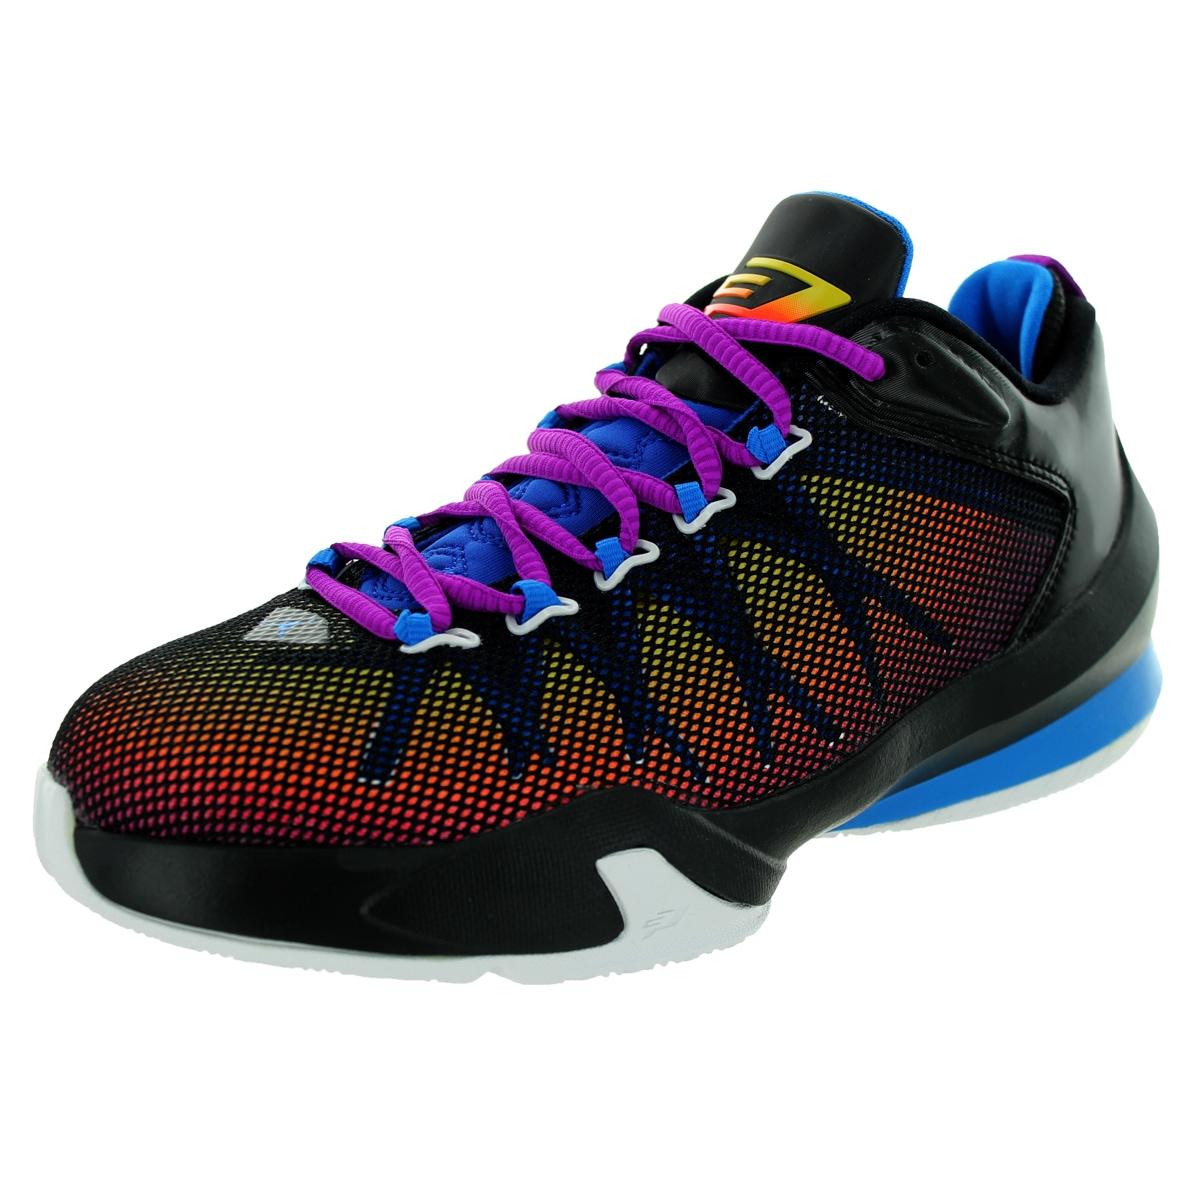 Nike Jordan Kid's Jordan Cp3.Viii Ae Bg Black/Vvd Purple ...